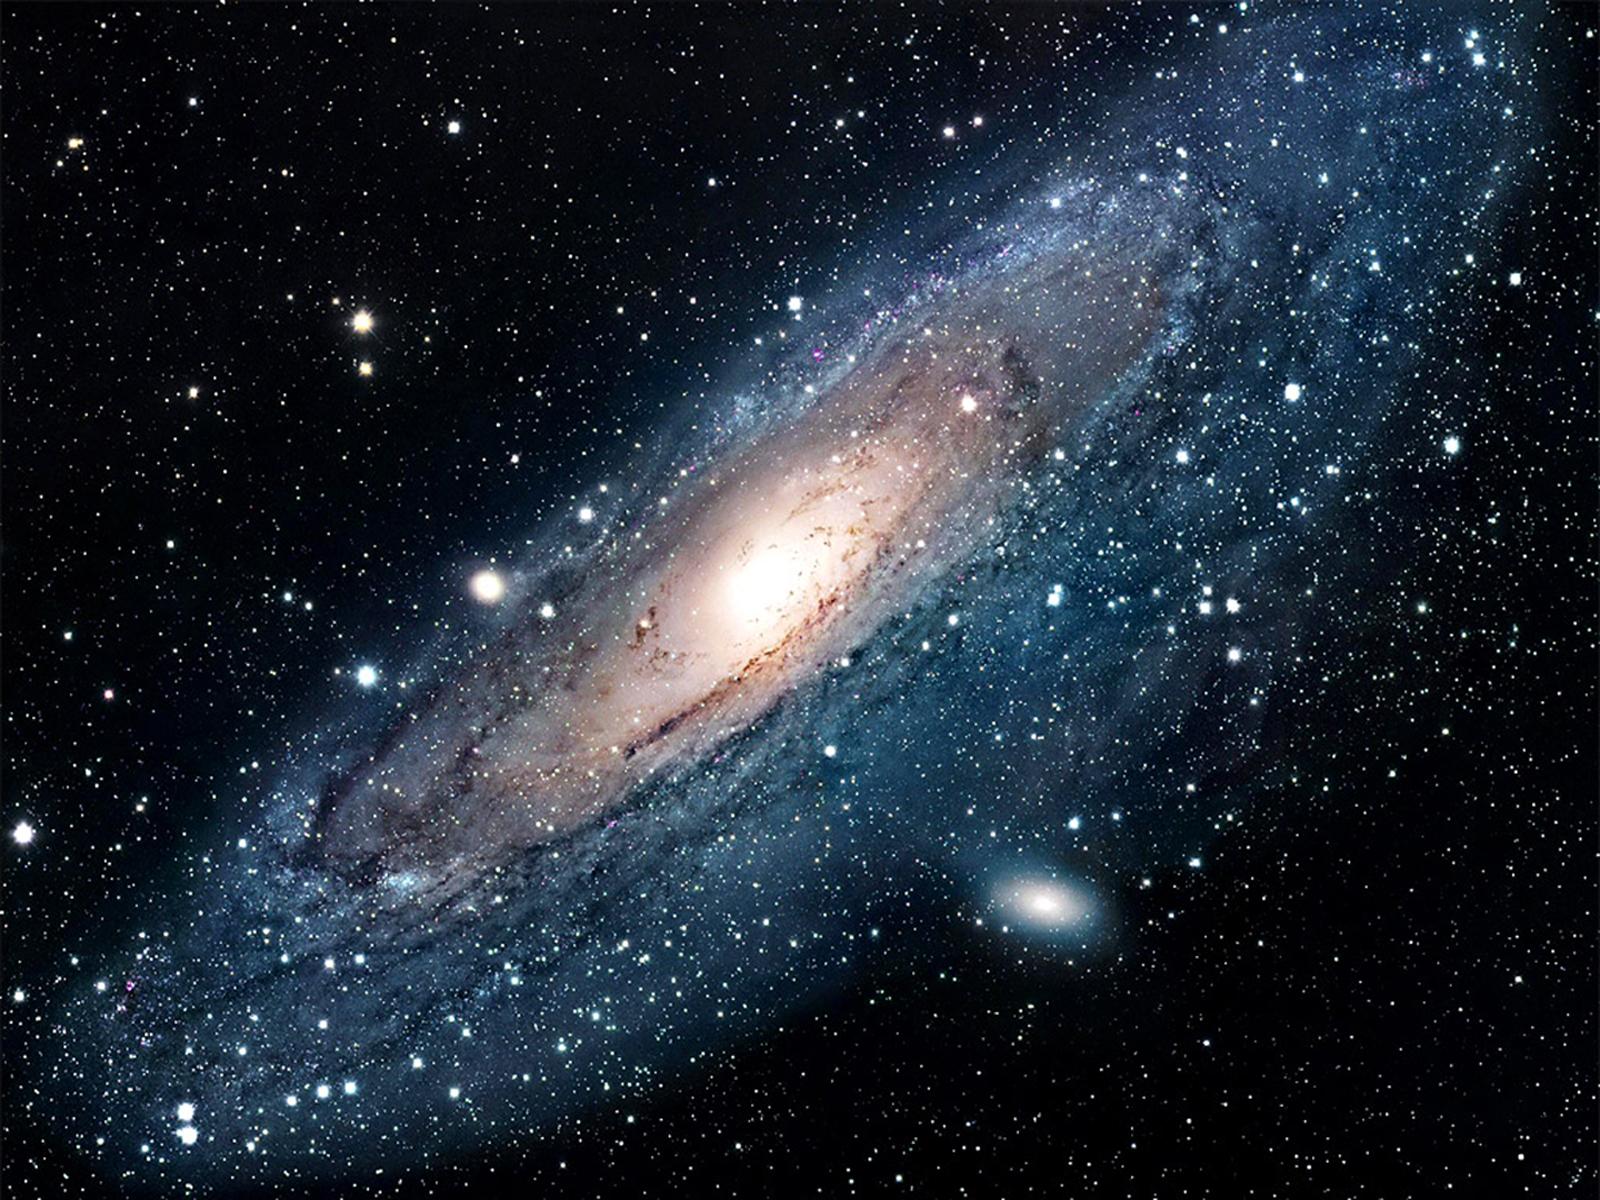 46 Universe Wallpaper Galaxies On Wallpapersafari